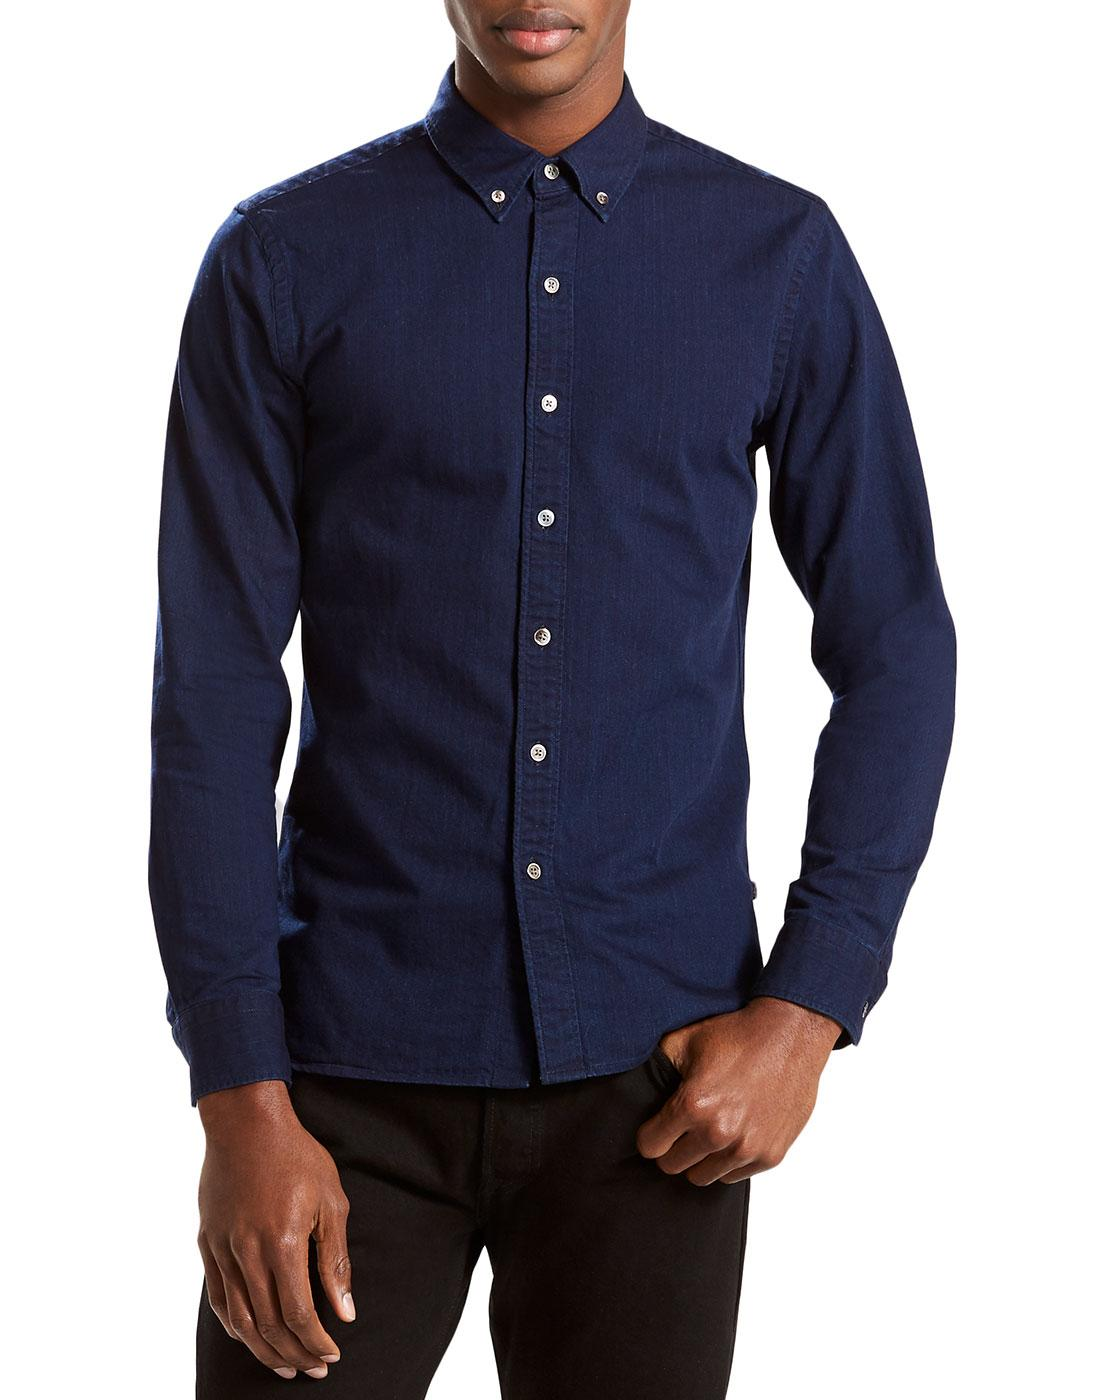 LEVI'S Pacific Mod Button Down Indigo Denim Shirt